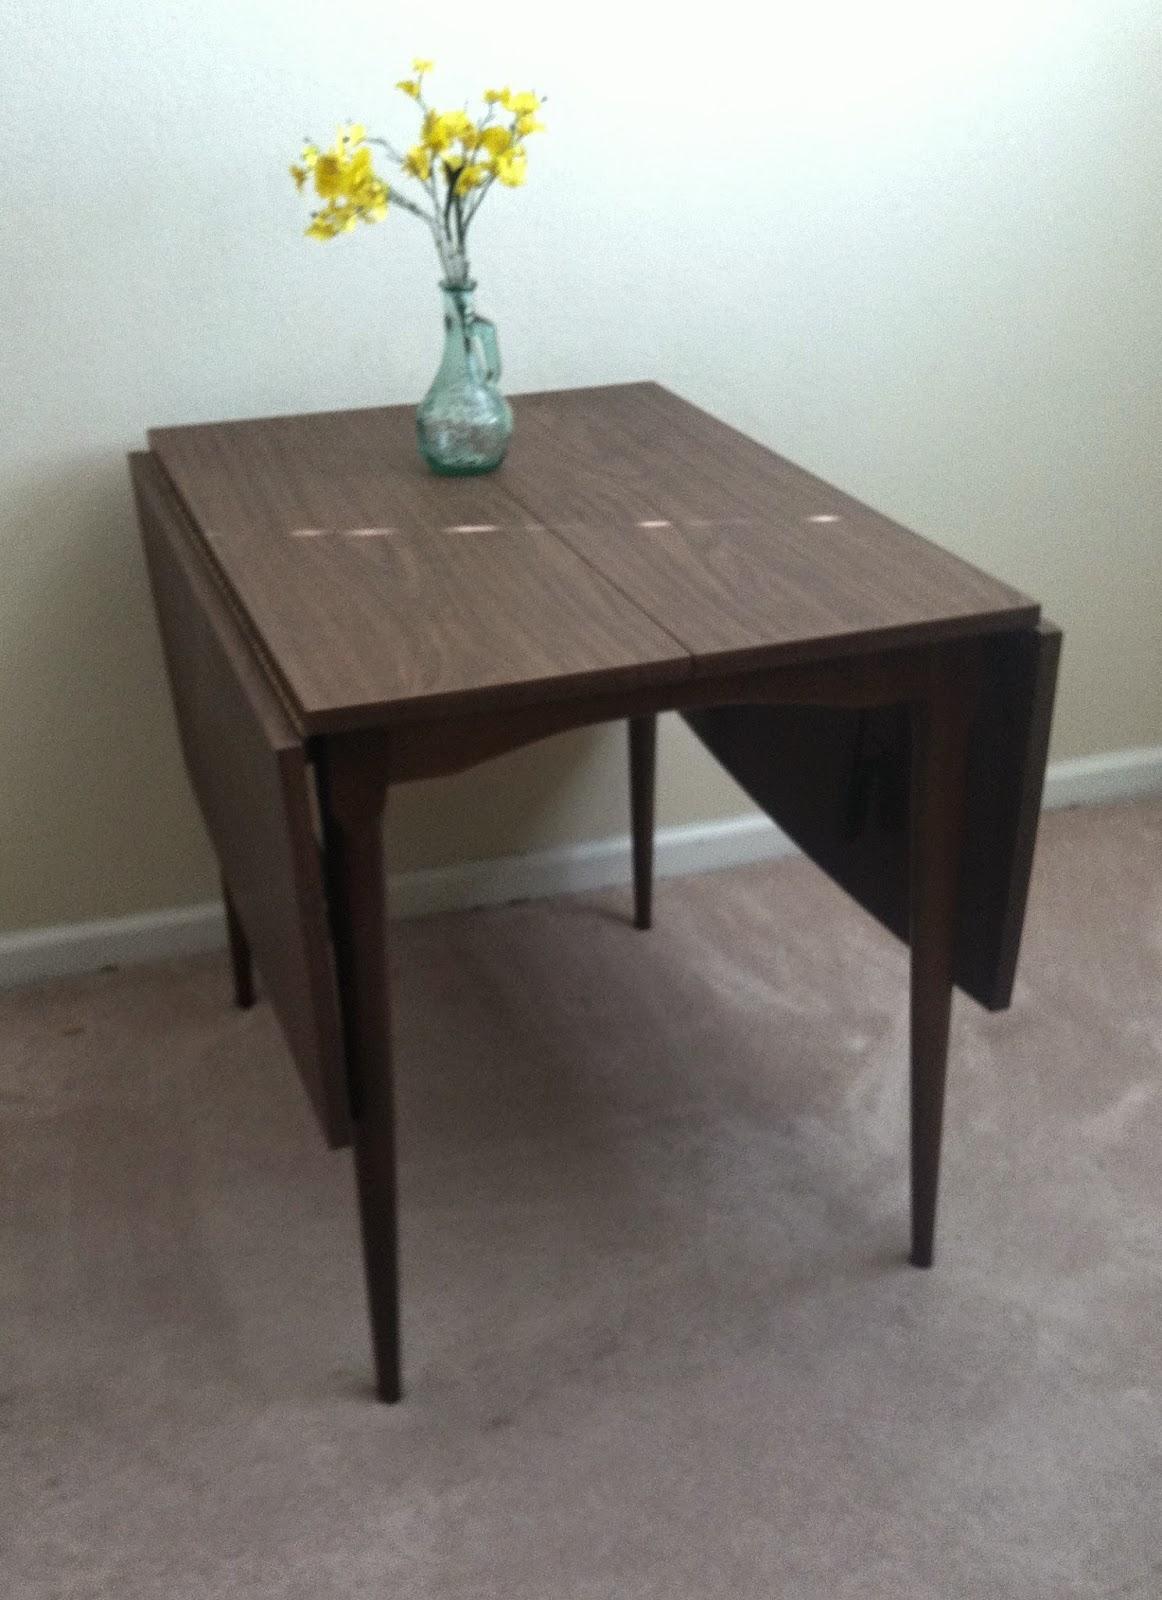 Refurnitured : Mid Century Modern Drop Leaf Table $60